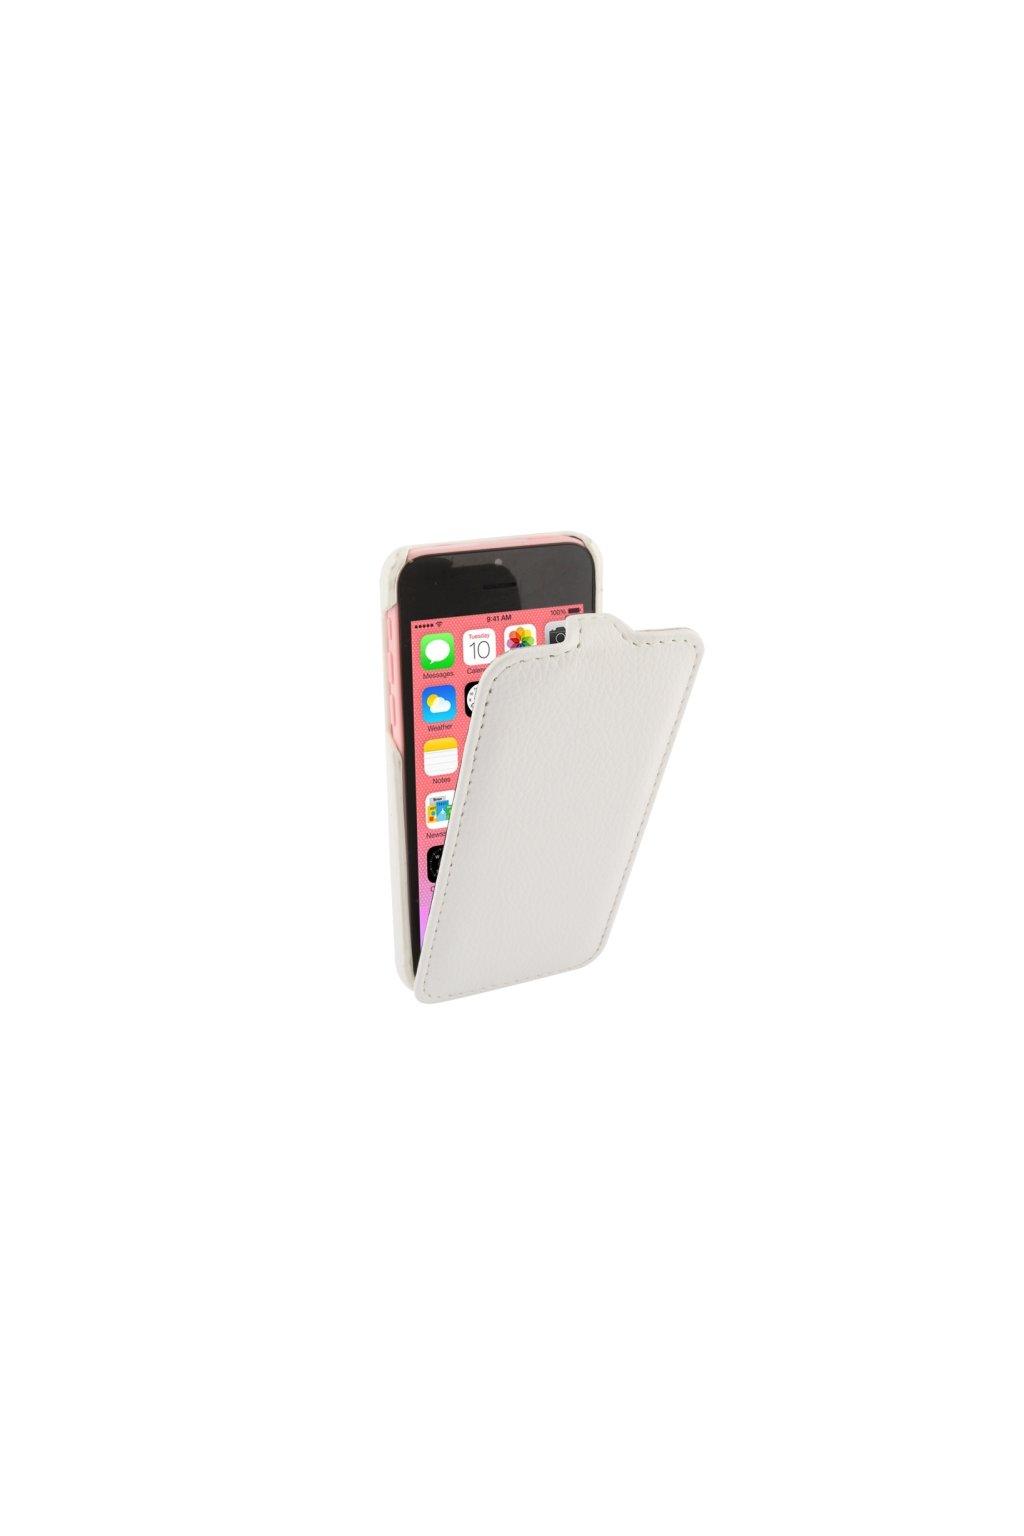 Pouzdro flip Melkco iPhone 5C, white/bílá